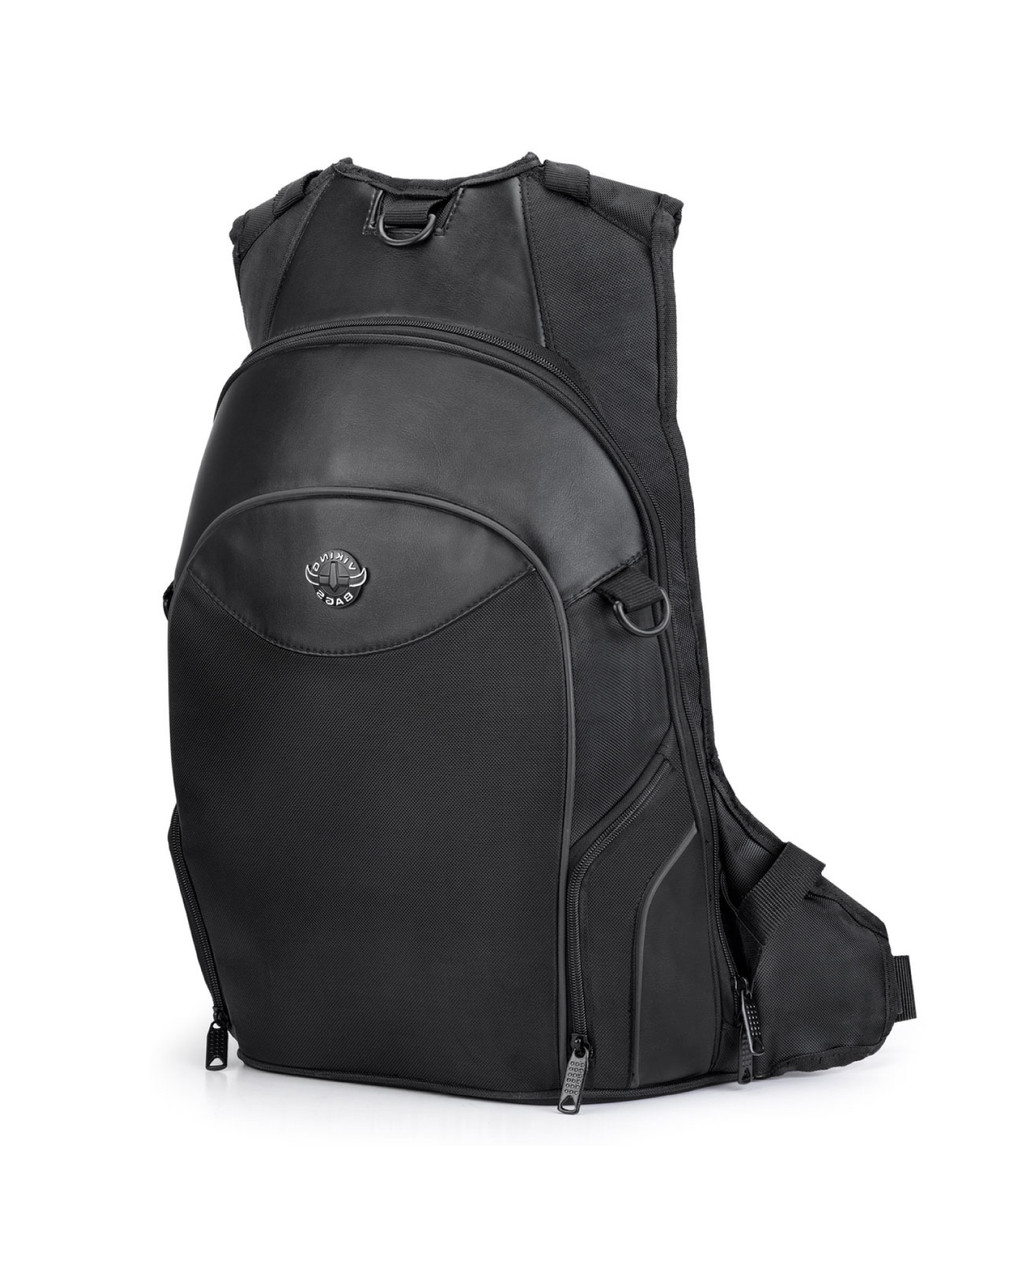 Honda Viking Motorcycle Medium Backpack Main Bag View